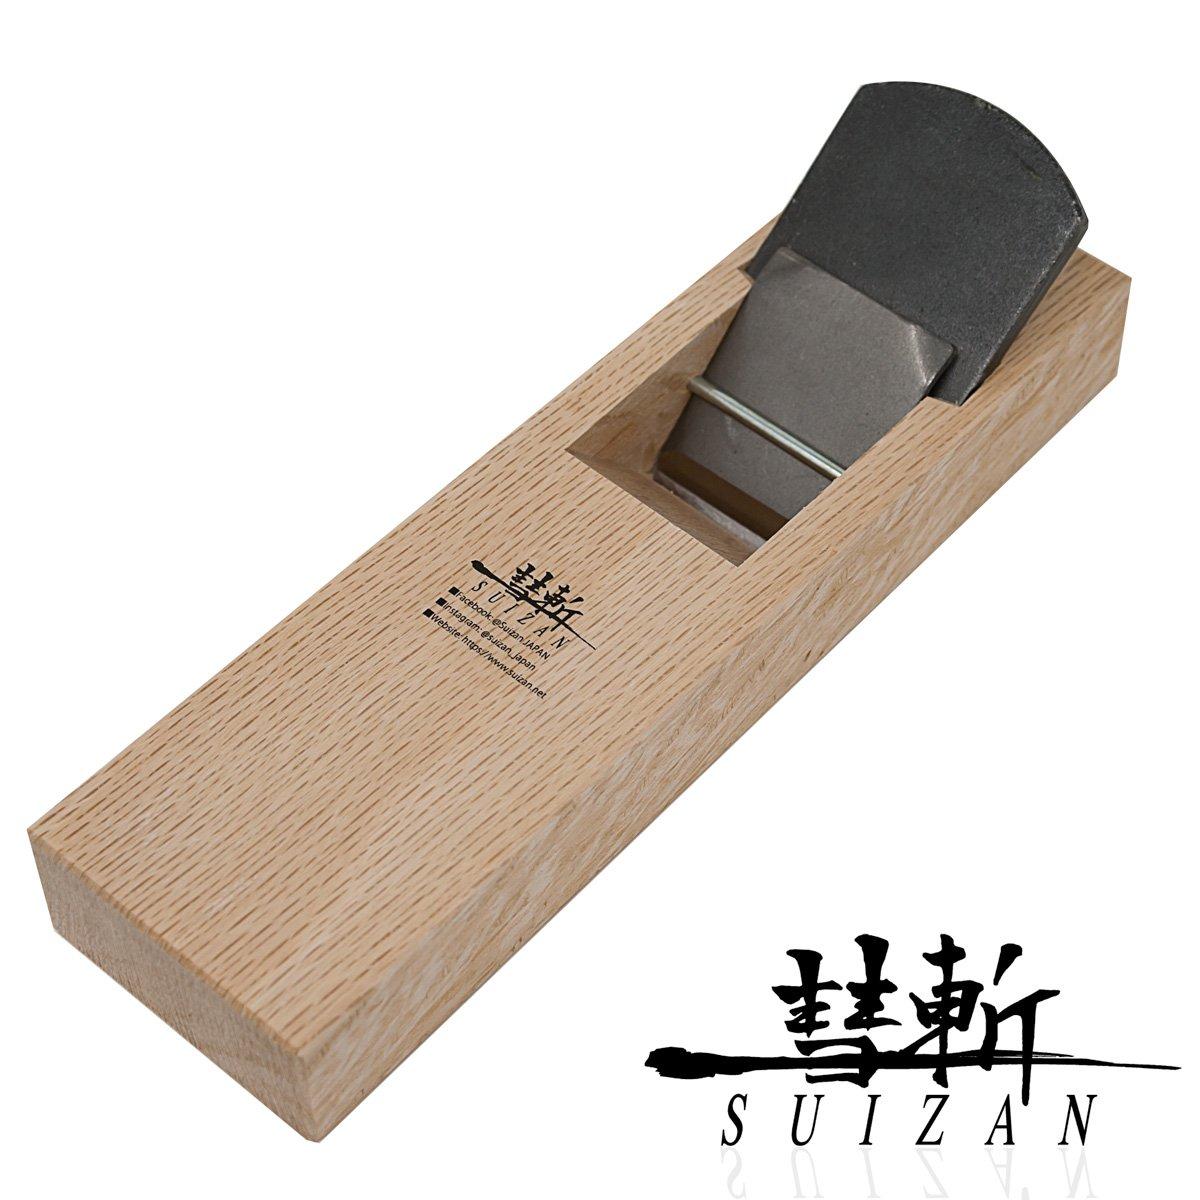 SUIZAN hand plane 60mm